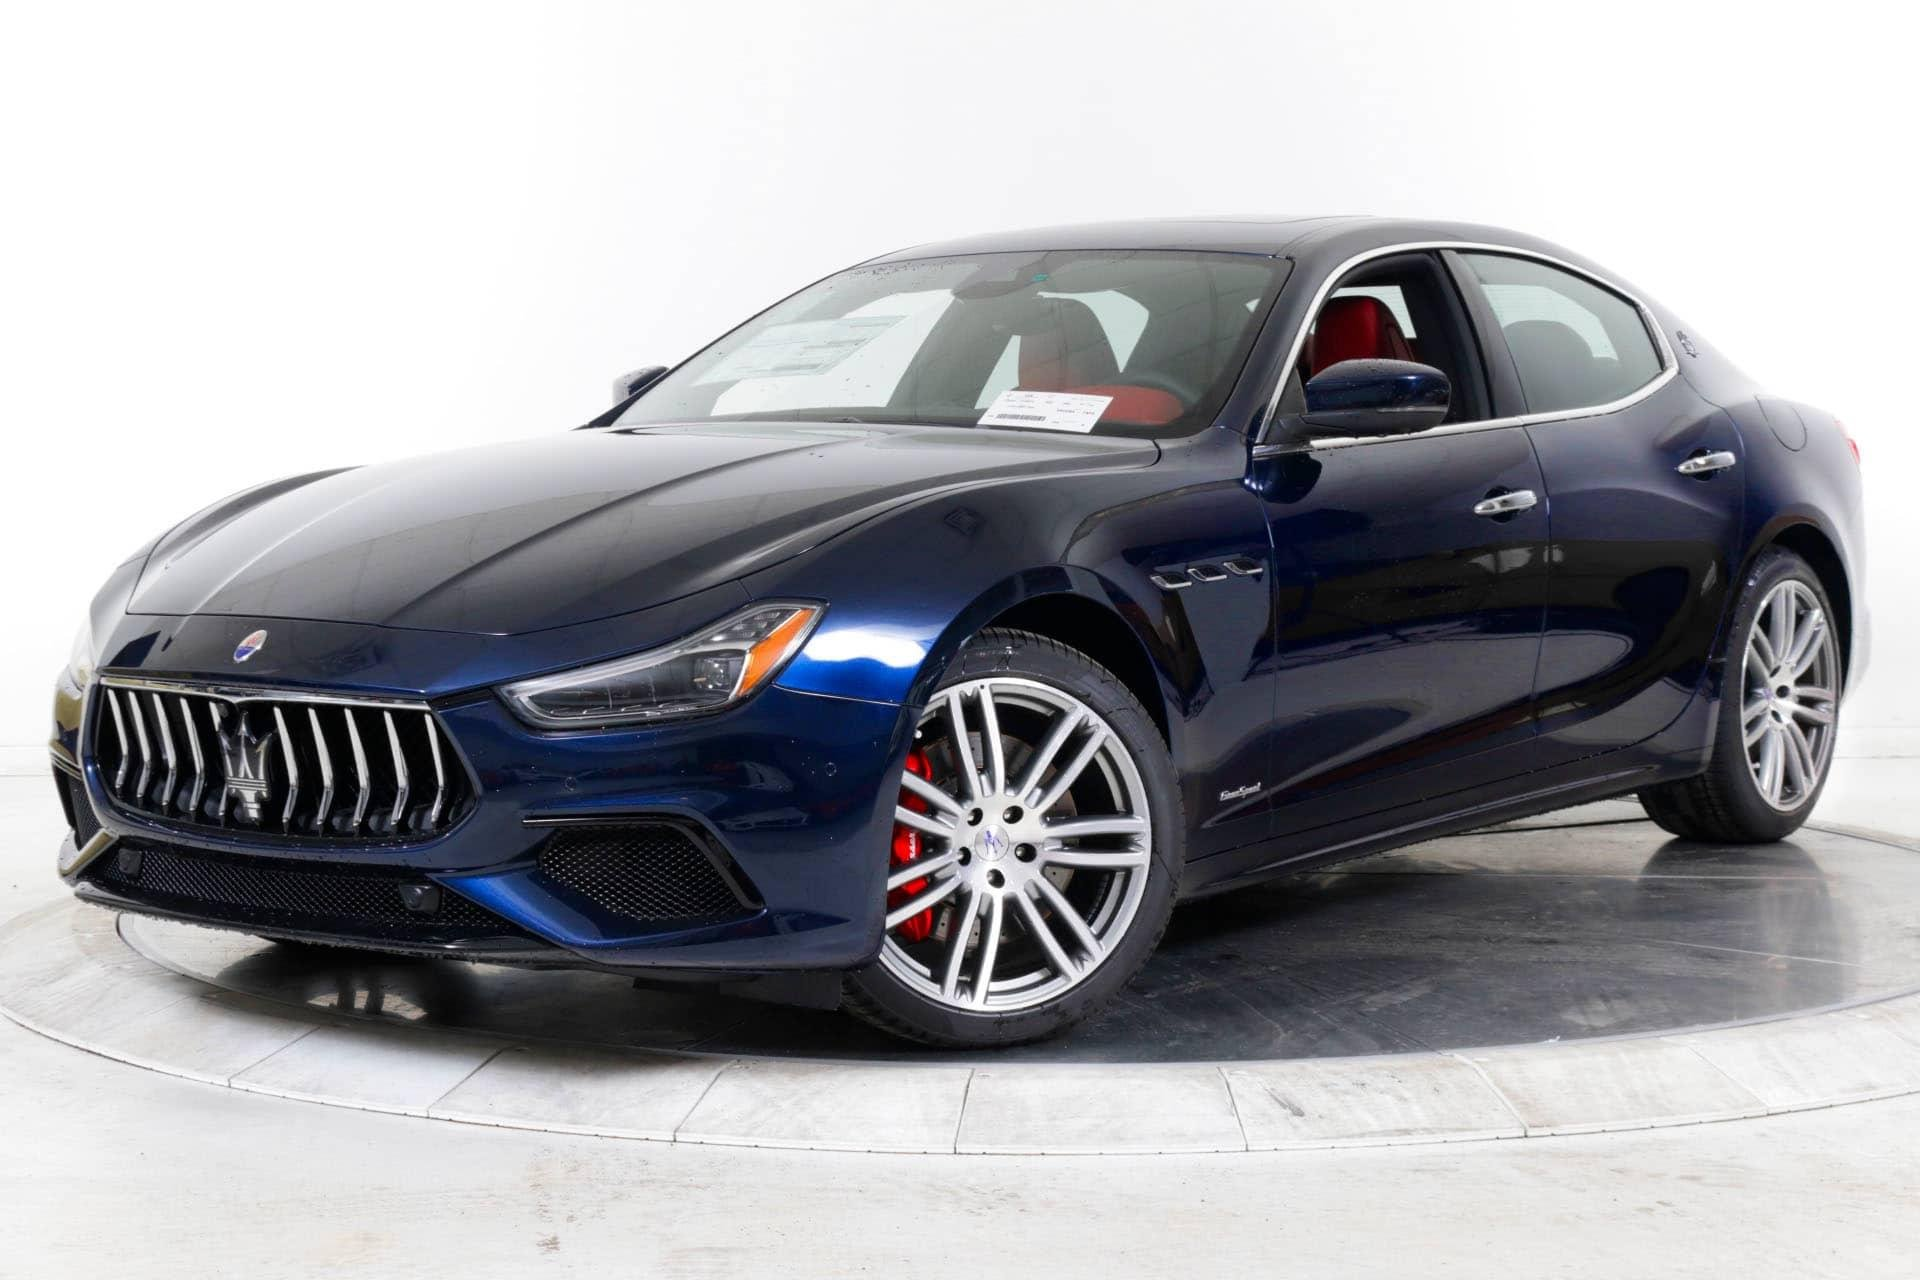 New 2019 Maserati-Ghibli SQ4 Ghibli SQ4 for sale $82,480 at M and V Leasing in Brooklyn NY 11223 1